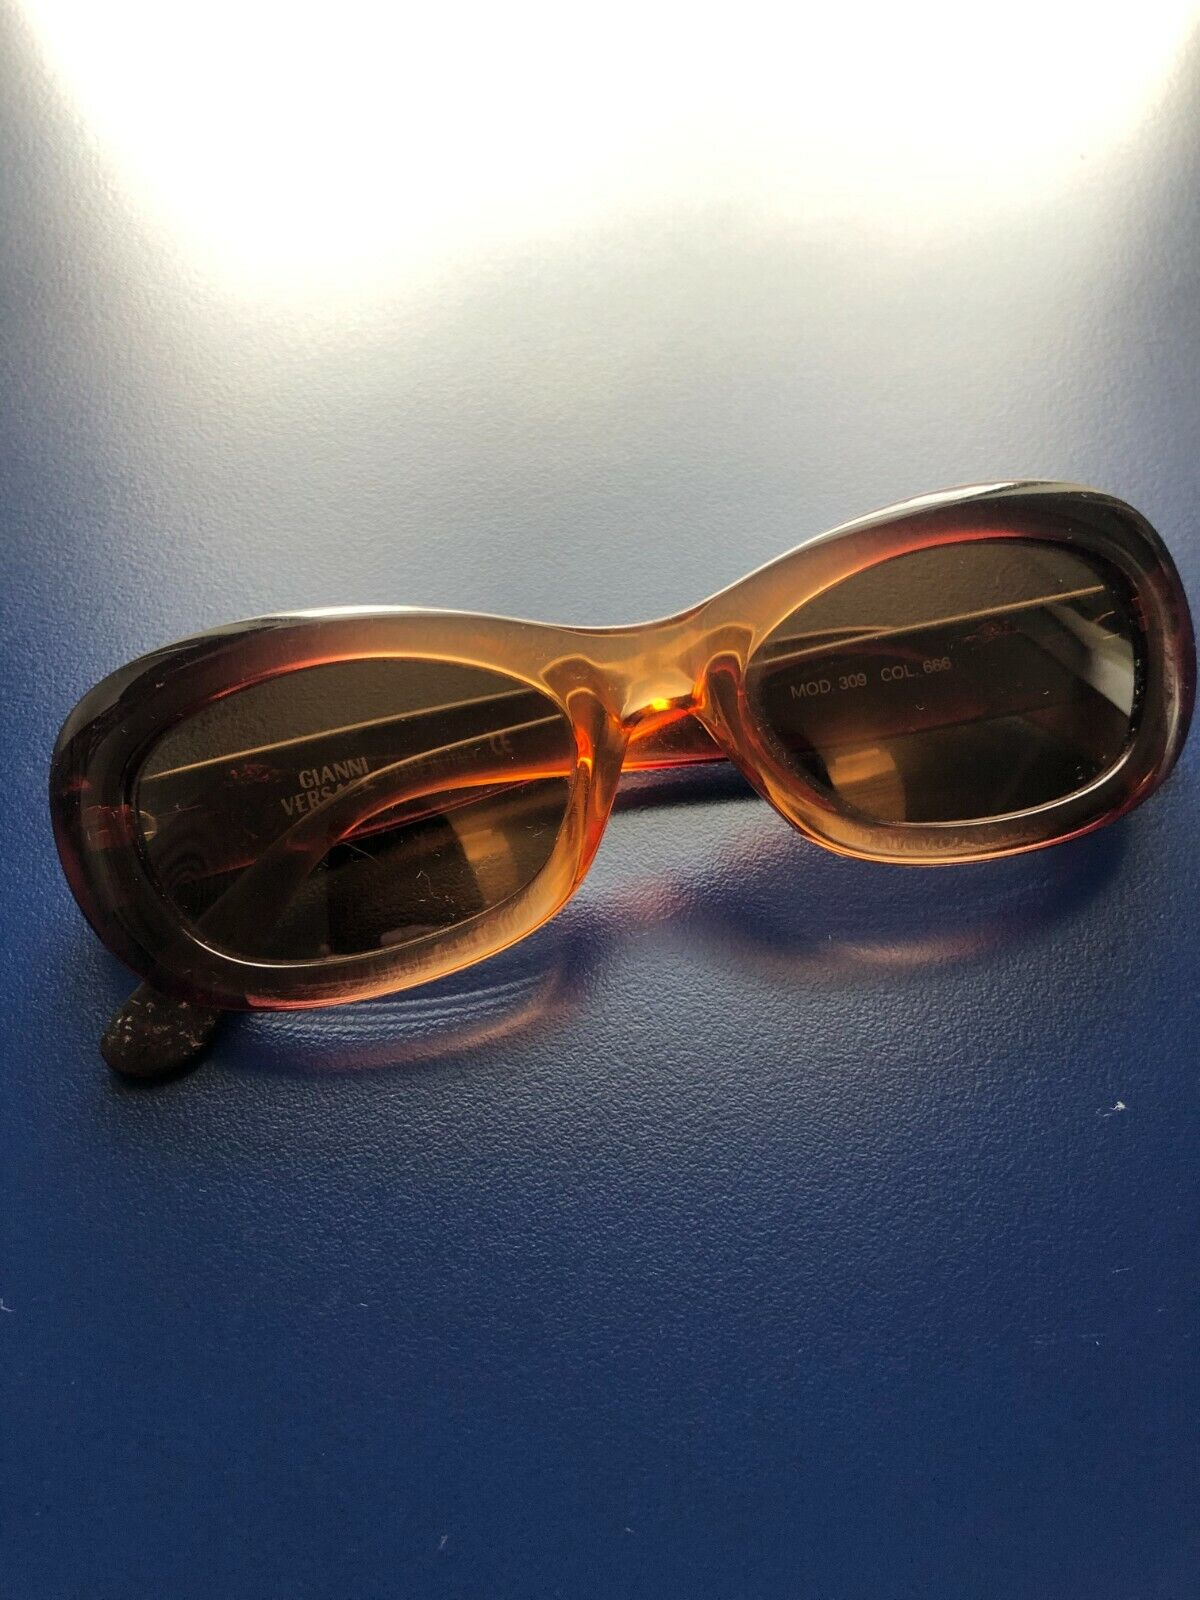 Vintage Gianni Versace brown gradient sunglasses - image 1